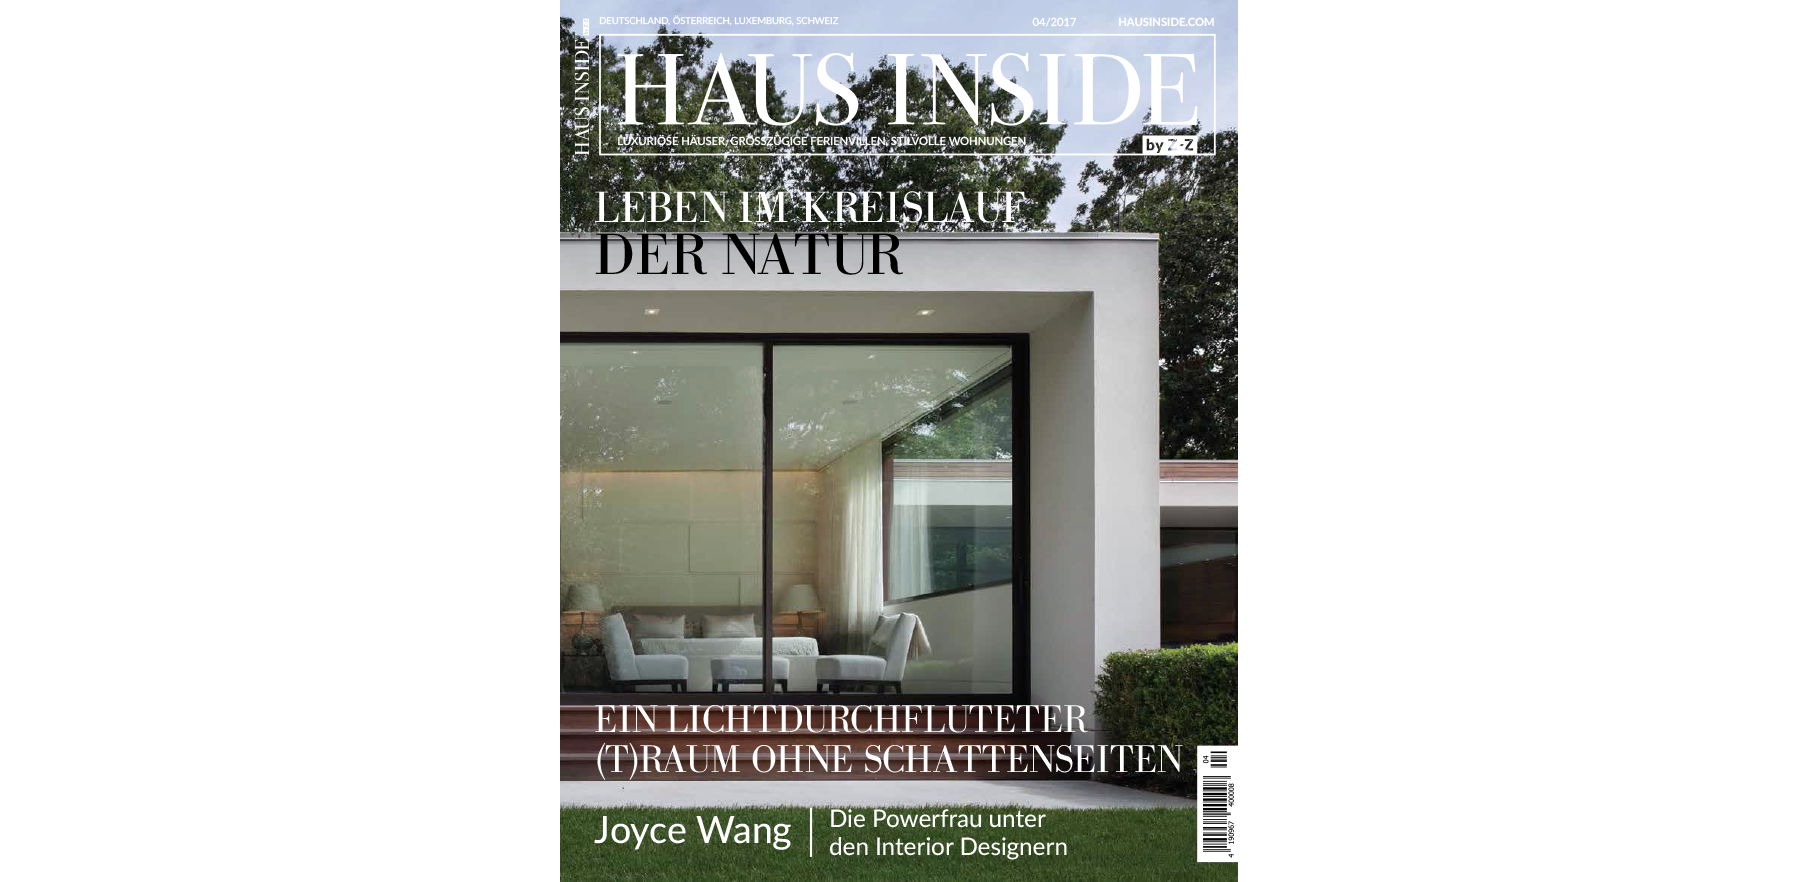 Office | architekten bda: Fuchs, Wacker.